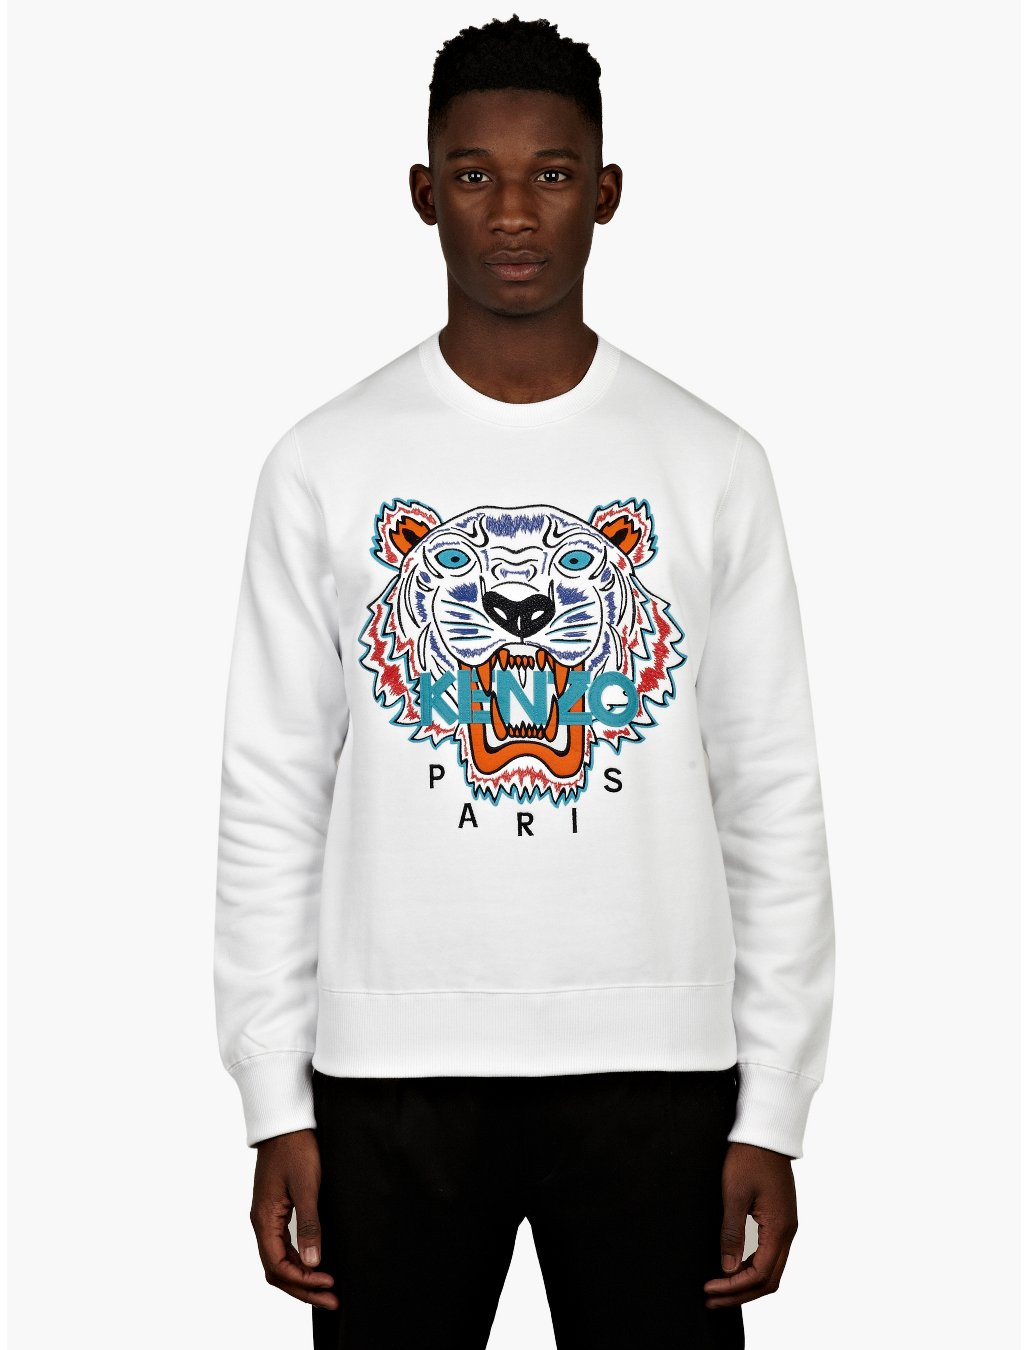 100 Cotton Mens Shirts